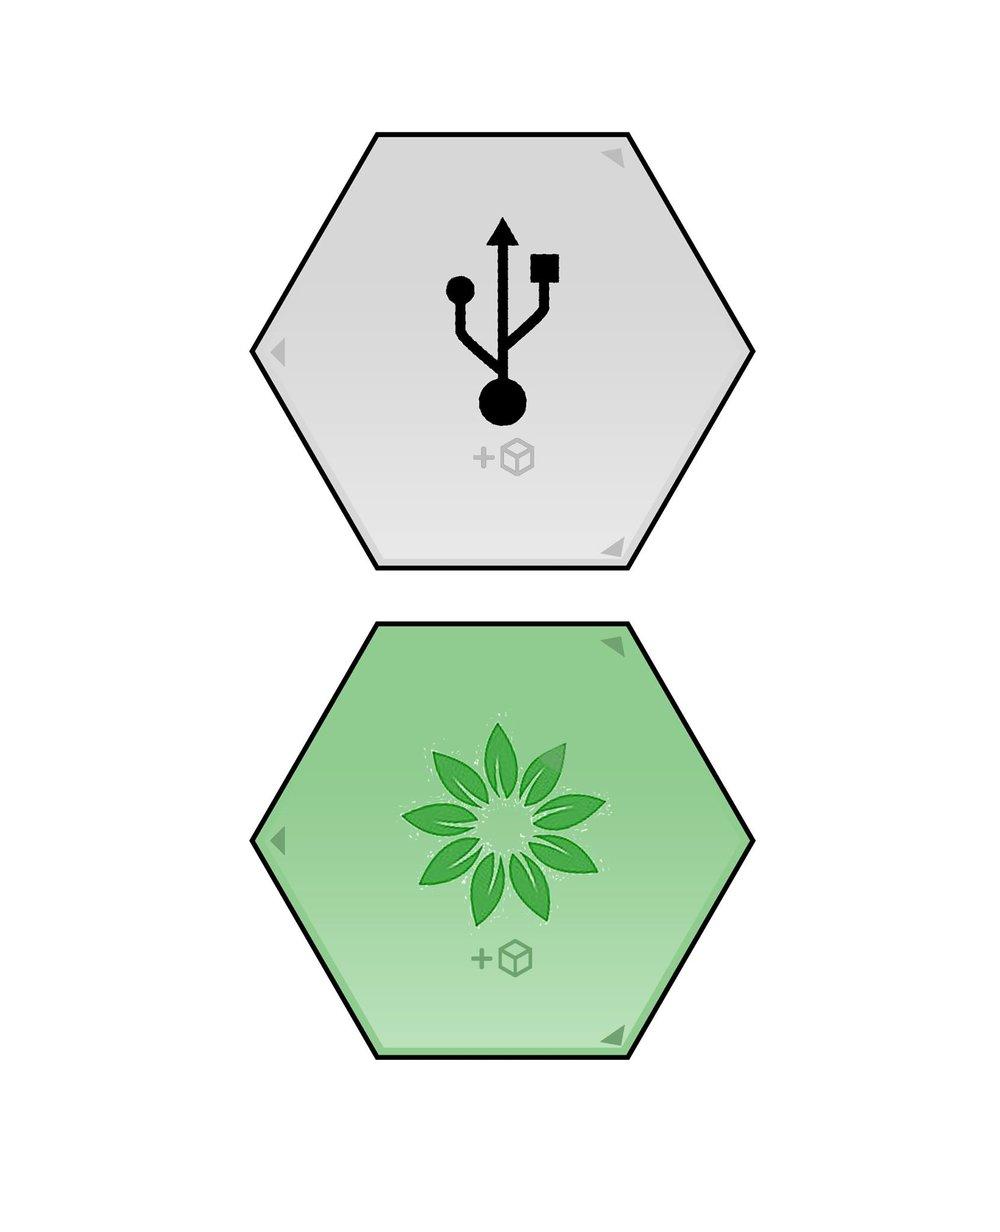 Initial tile concepts